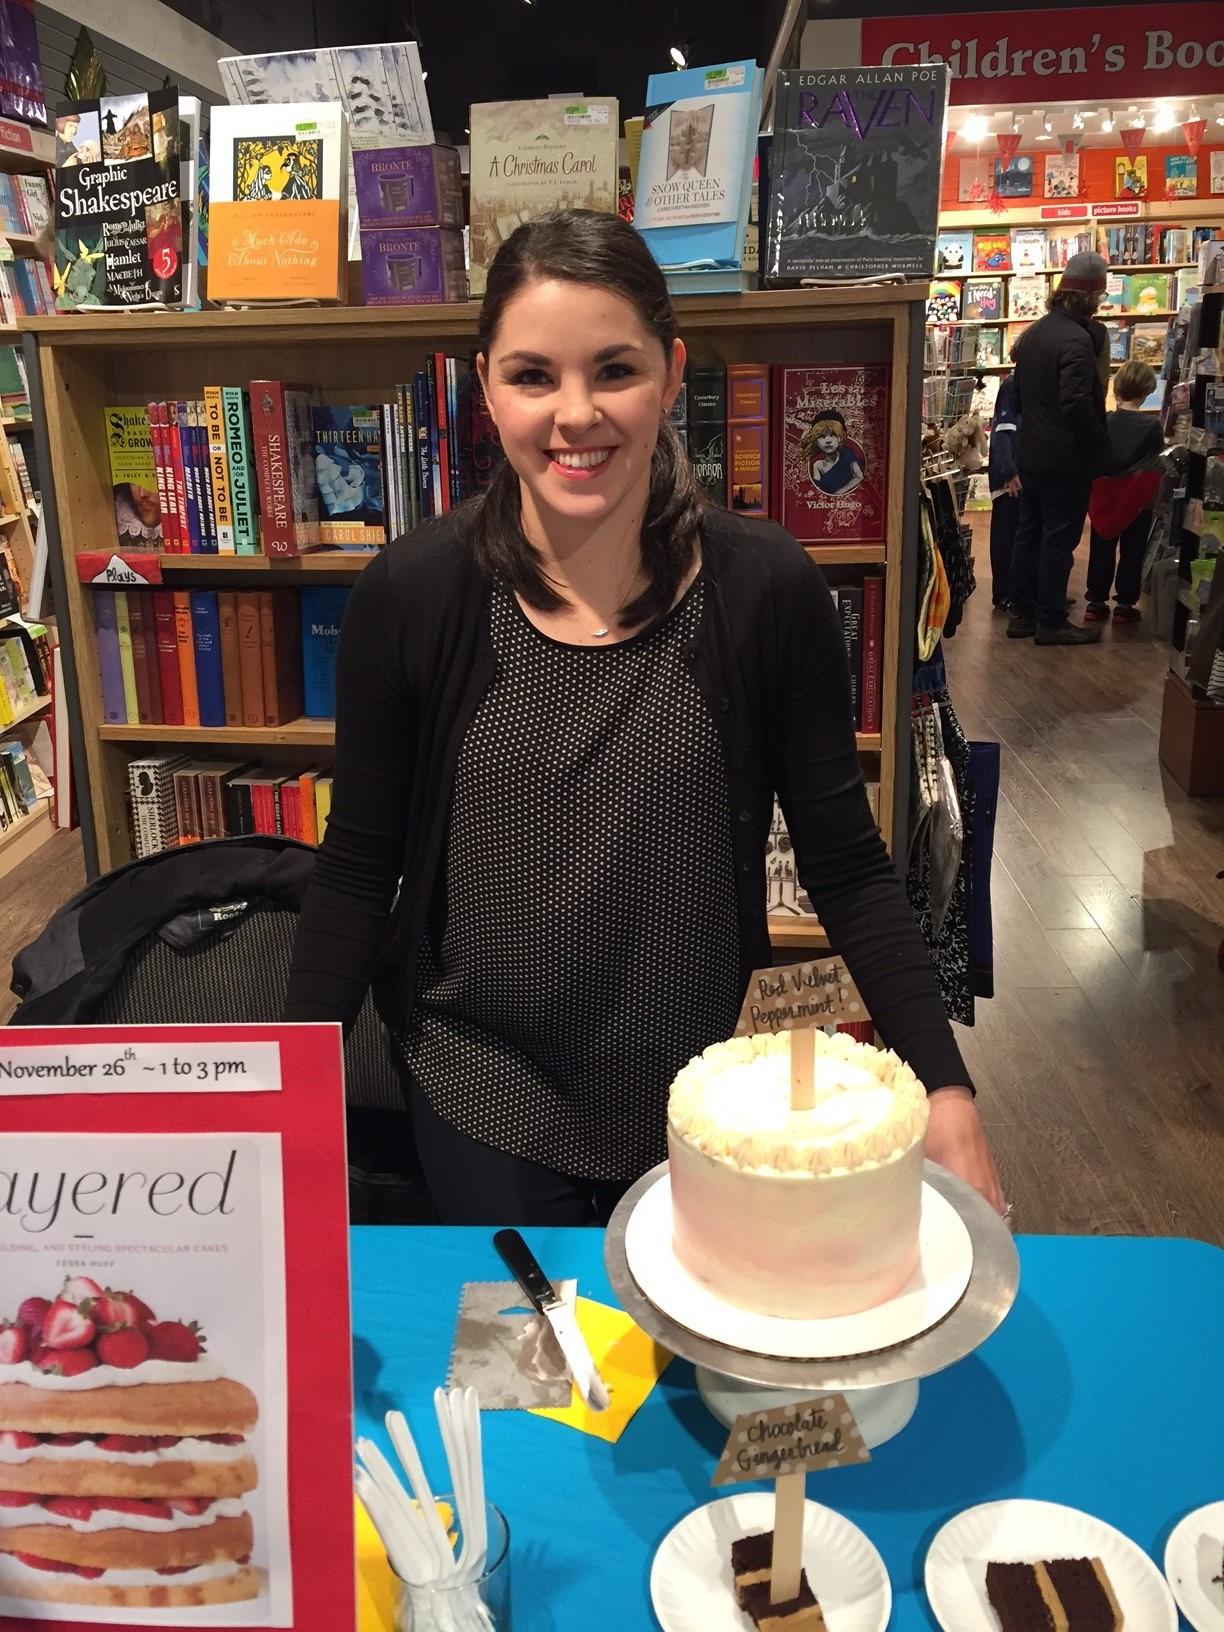 Tessa Huff Book warehouse Nov 2016 3.jpg